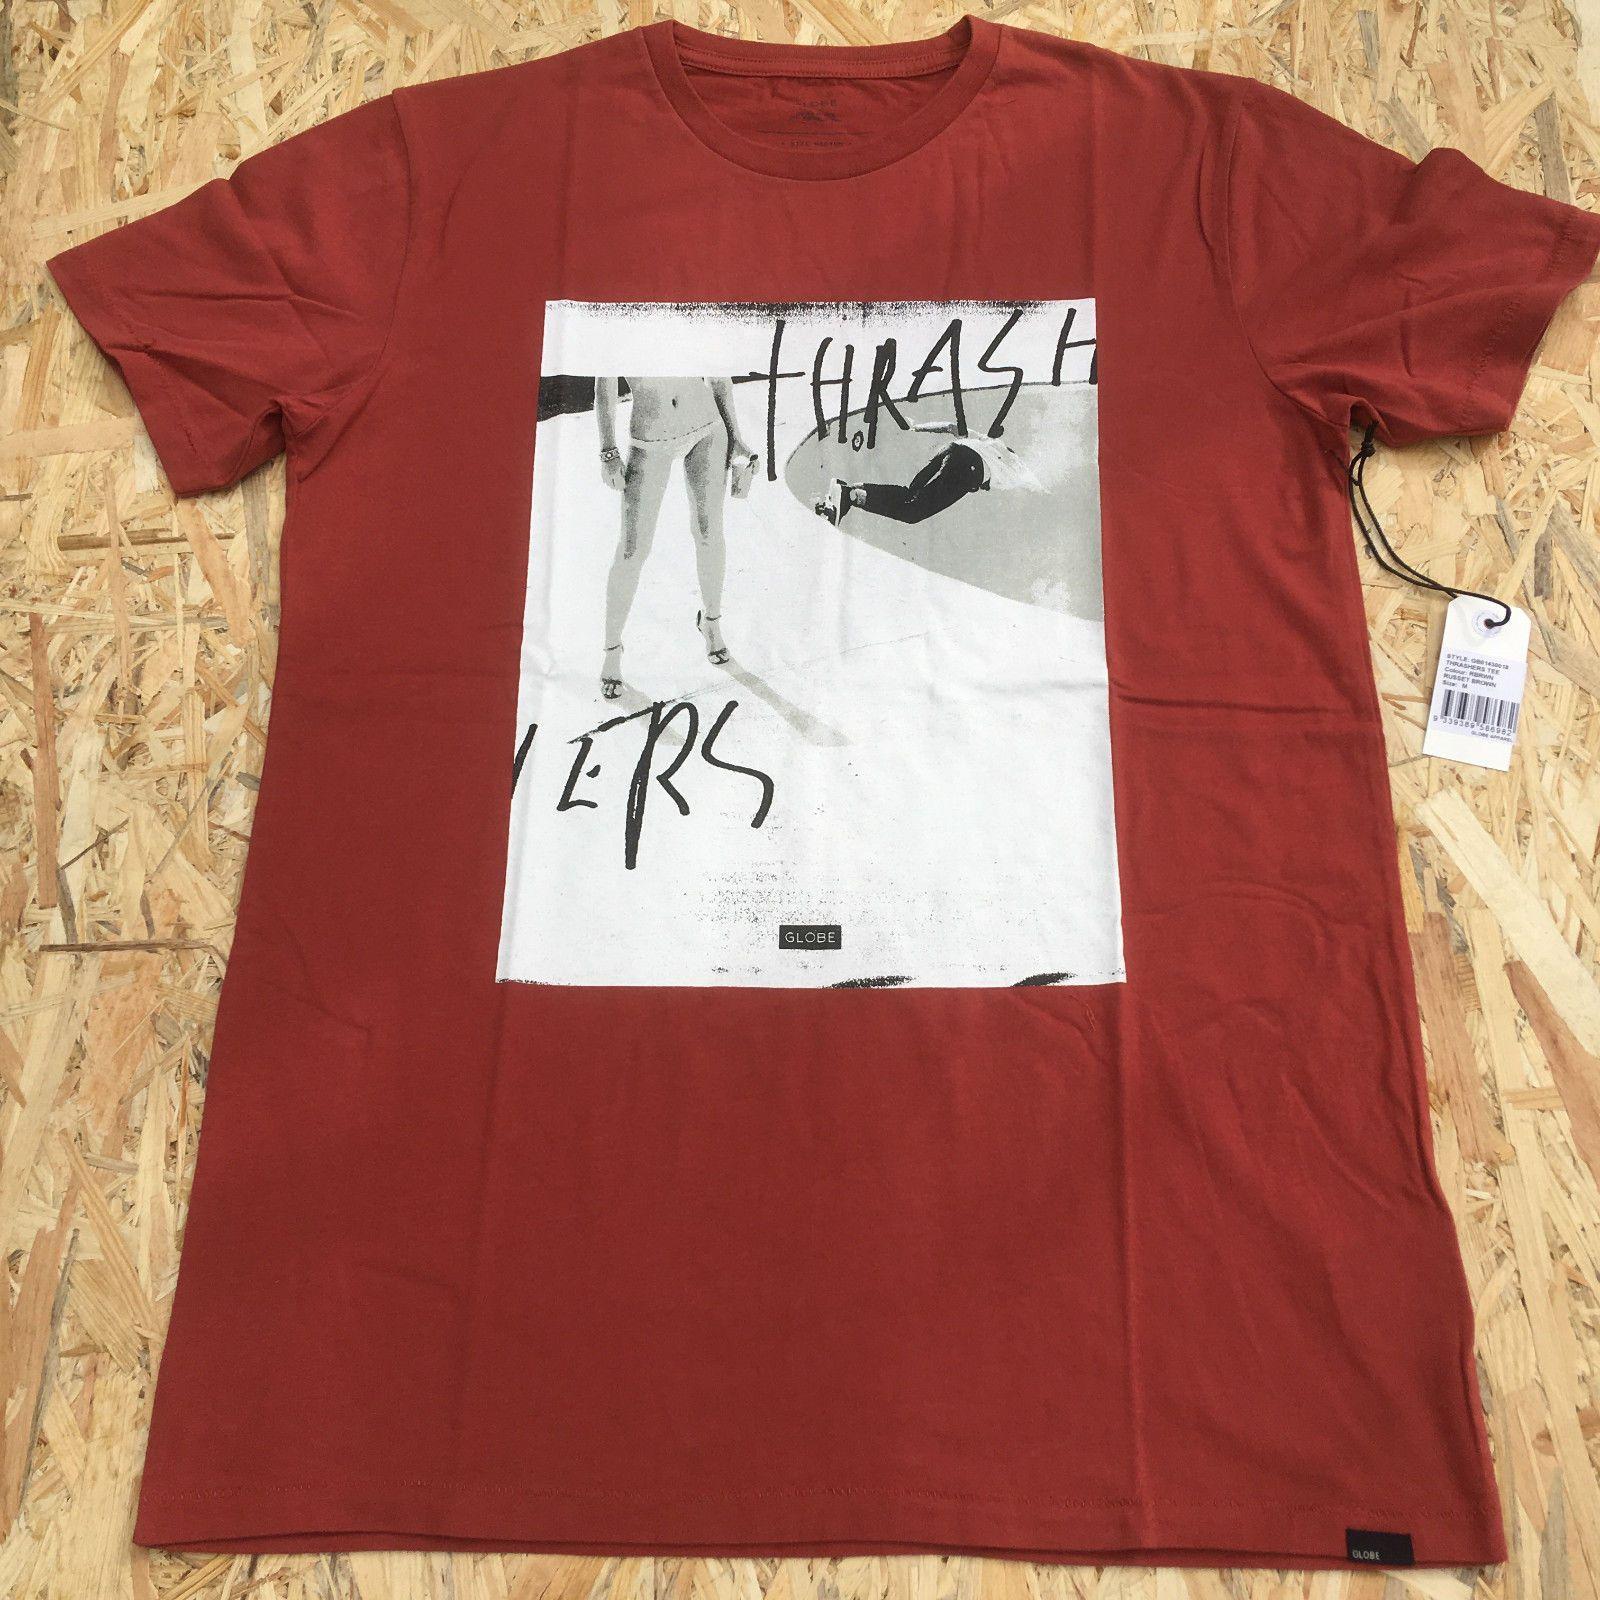 98c1553f9 Globe Brown 100% Cotton Print Men O Neck High Quality Hot Sell T Shirt Surf  Surfer Skate Skater Skateboard Street Wear Cool Shirt Designs T Shirt  Quotes ...